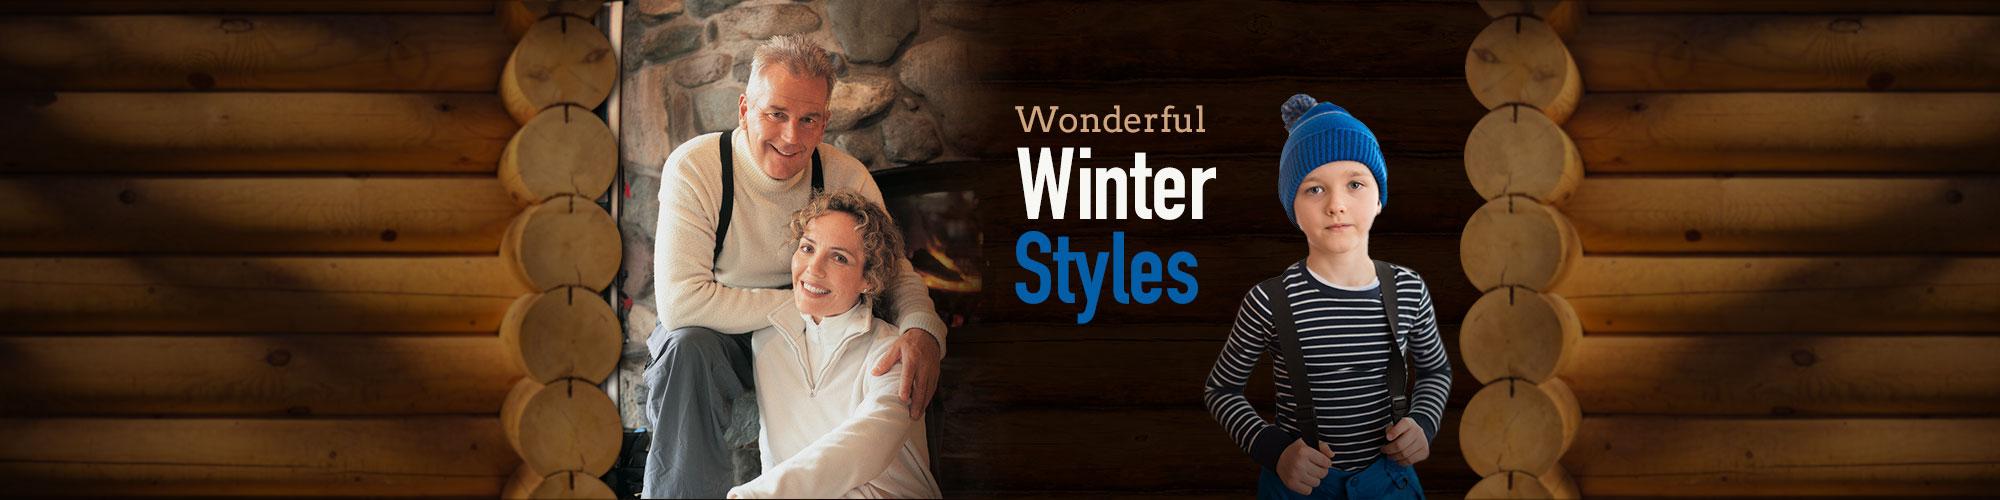 winter-styles